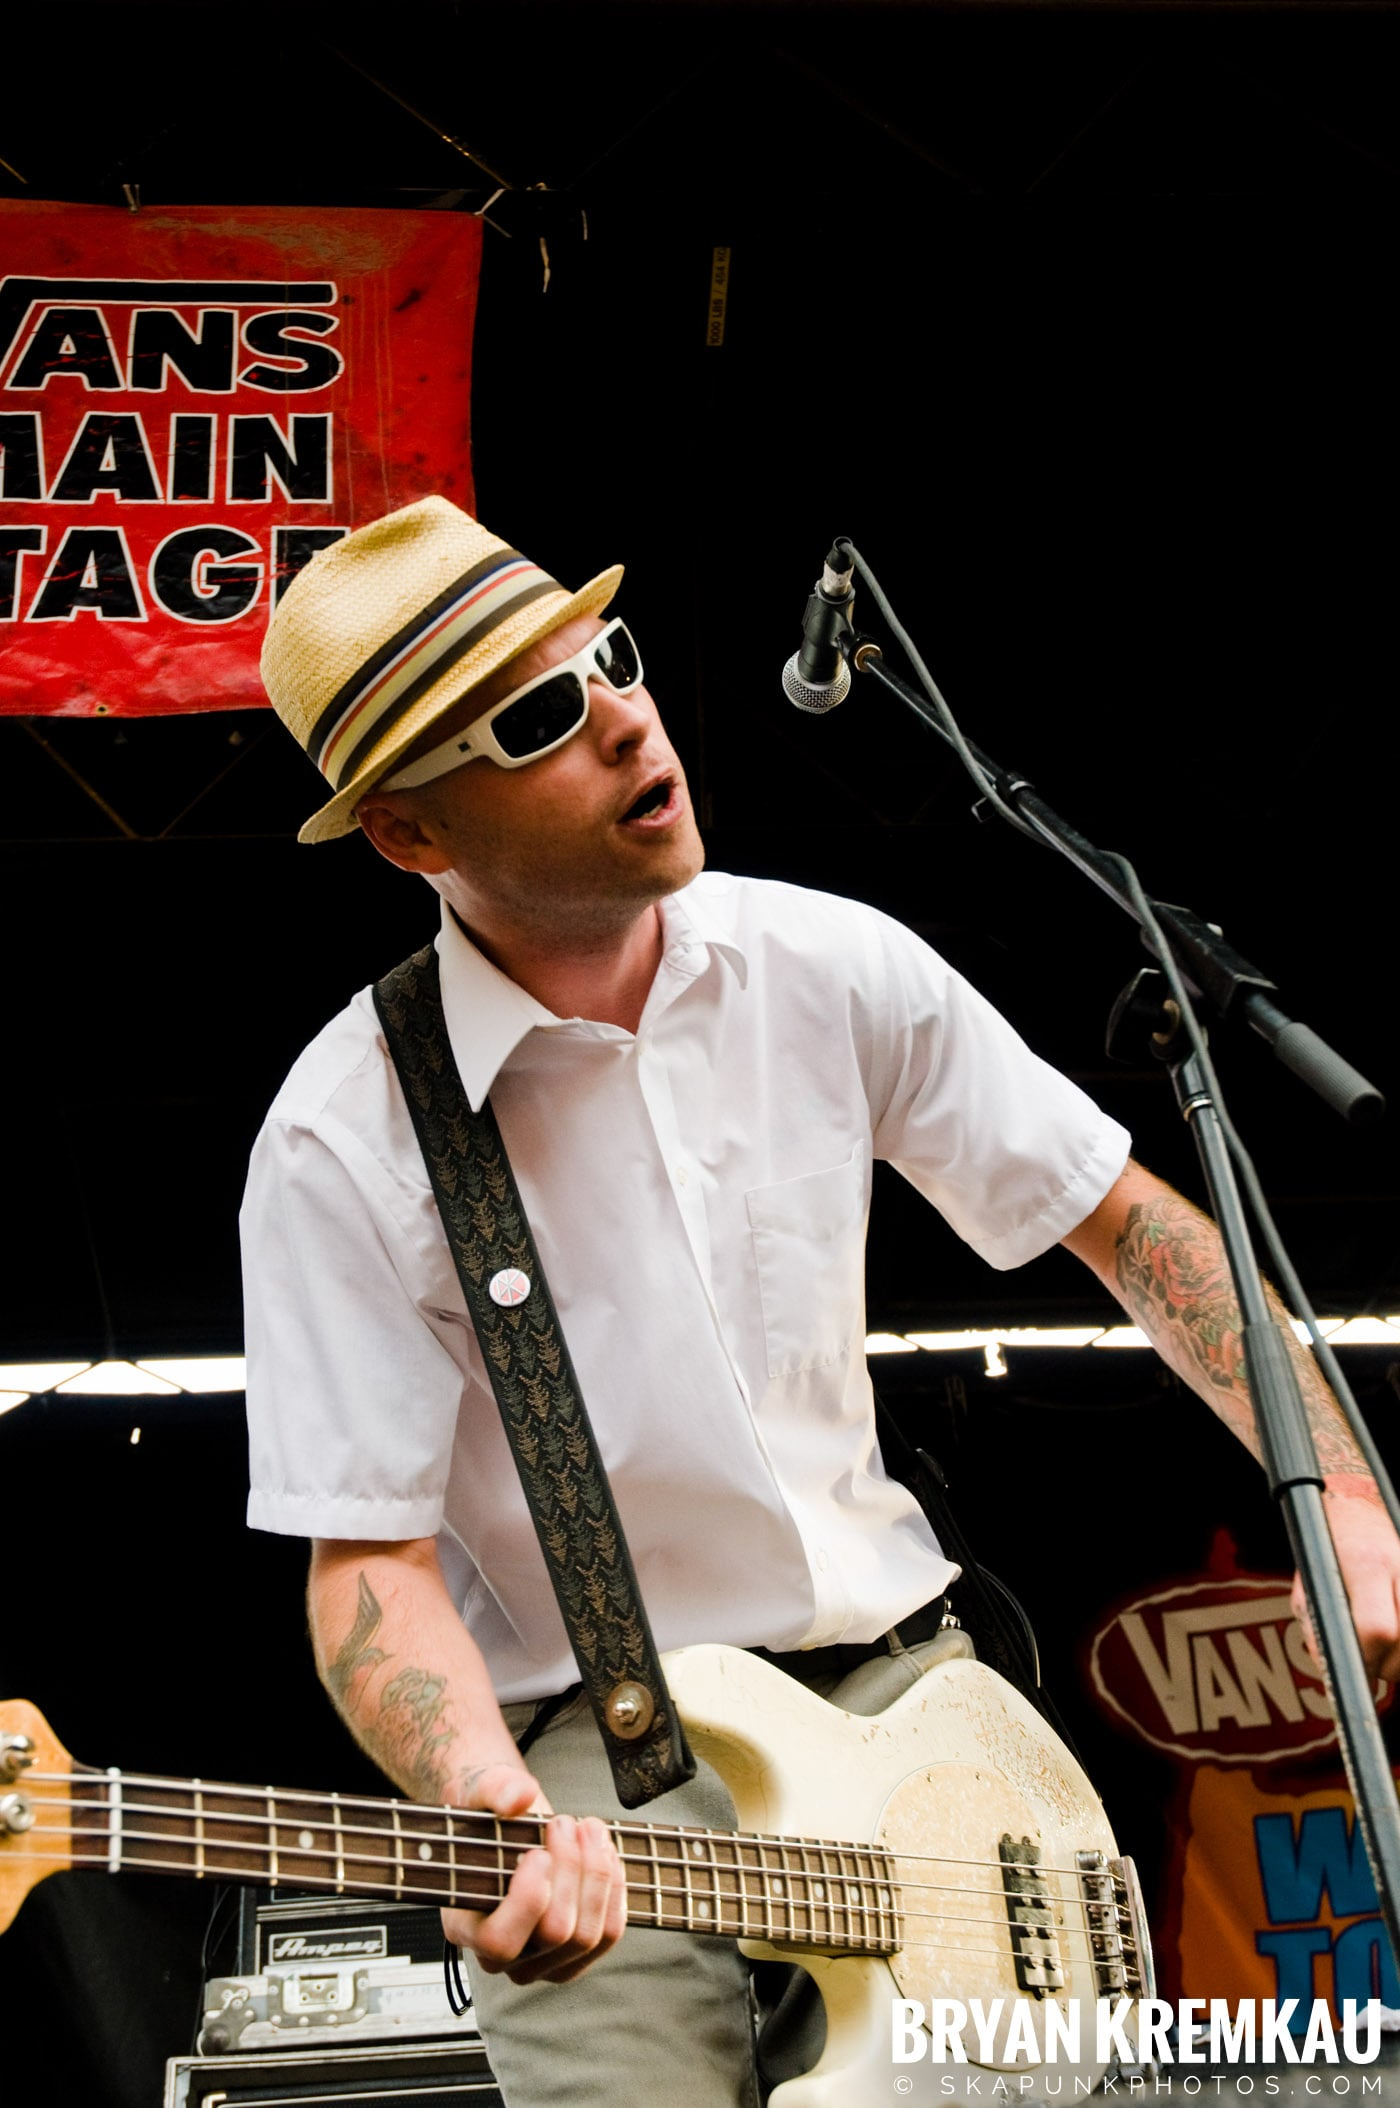 Flogging Molly @ Warped Tour 2009, Scranton PA - 07.15.09 (11)